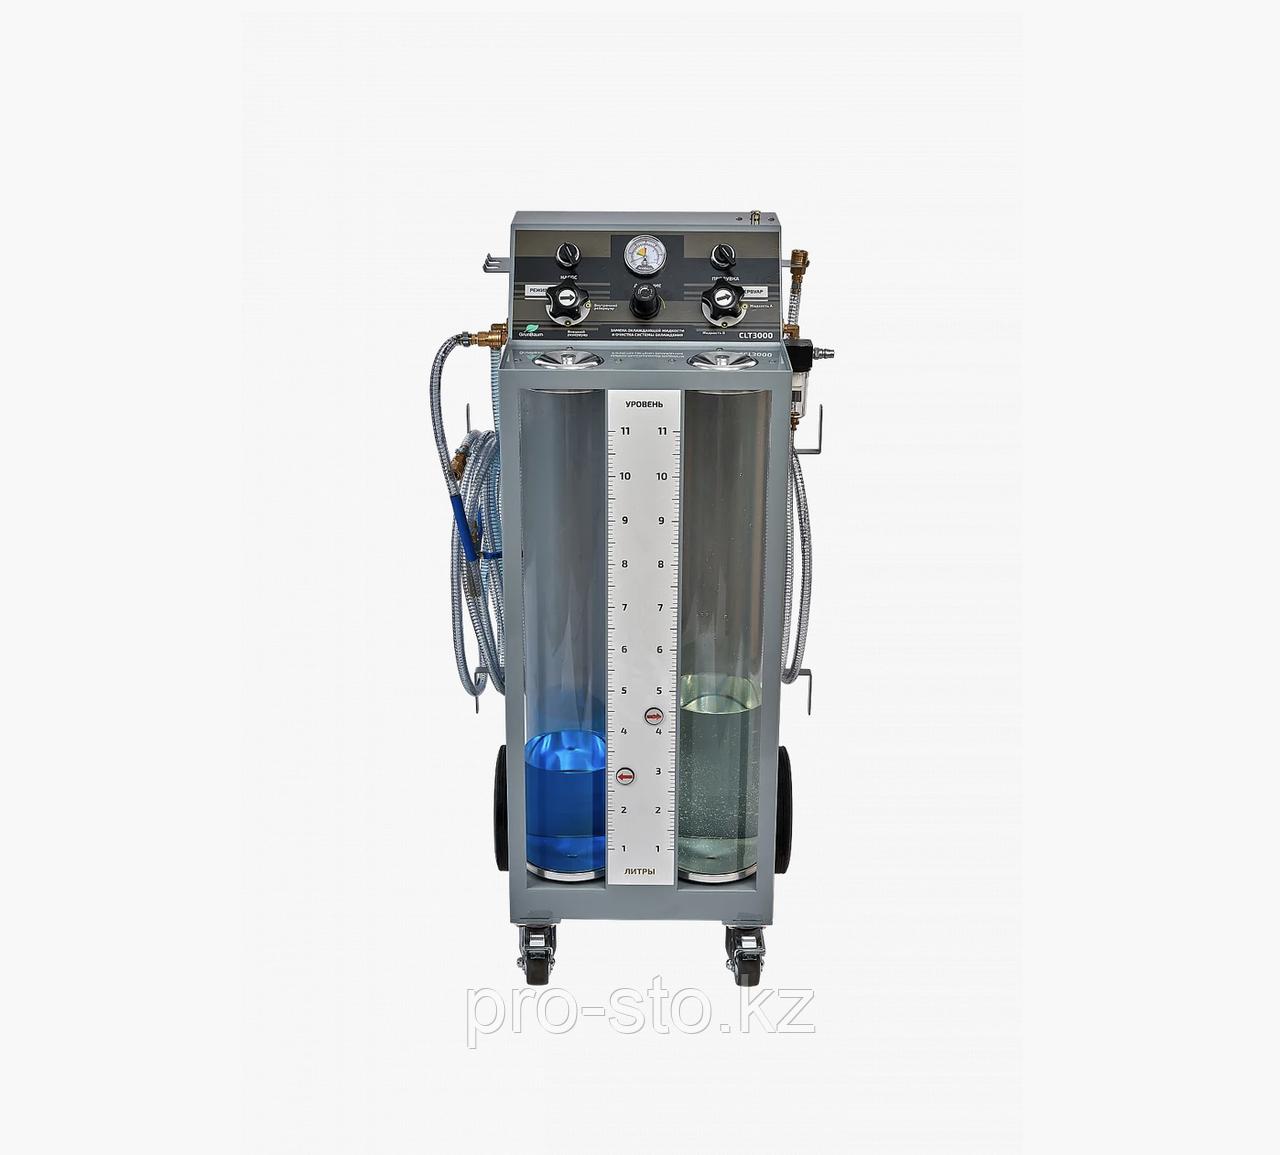 Установка для замены антифриза GrunBaum CLT3000 - фото 4